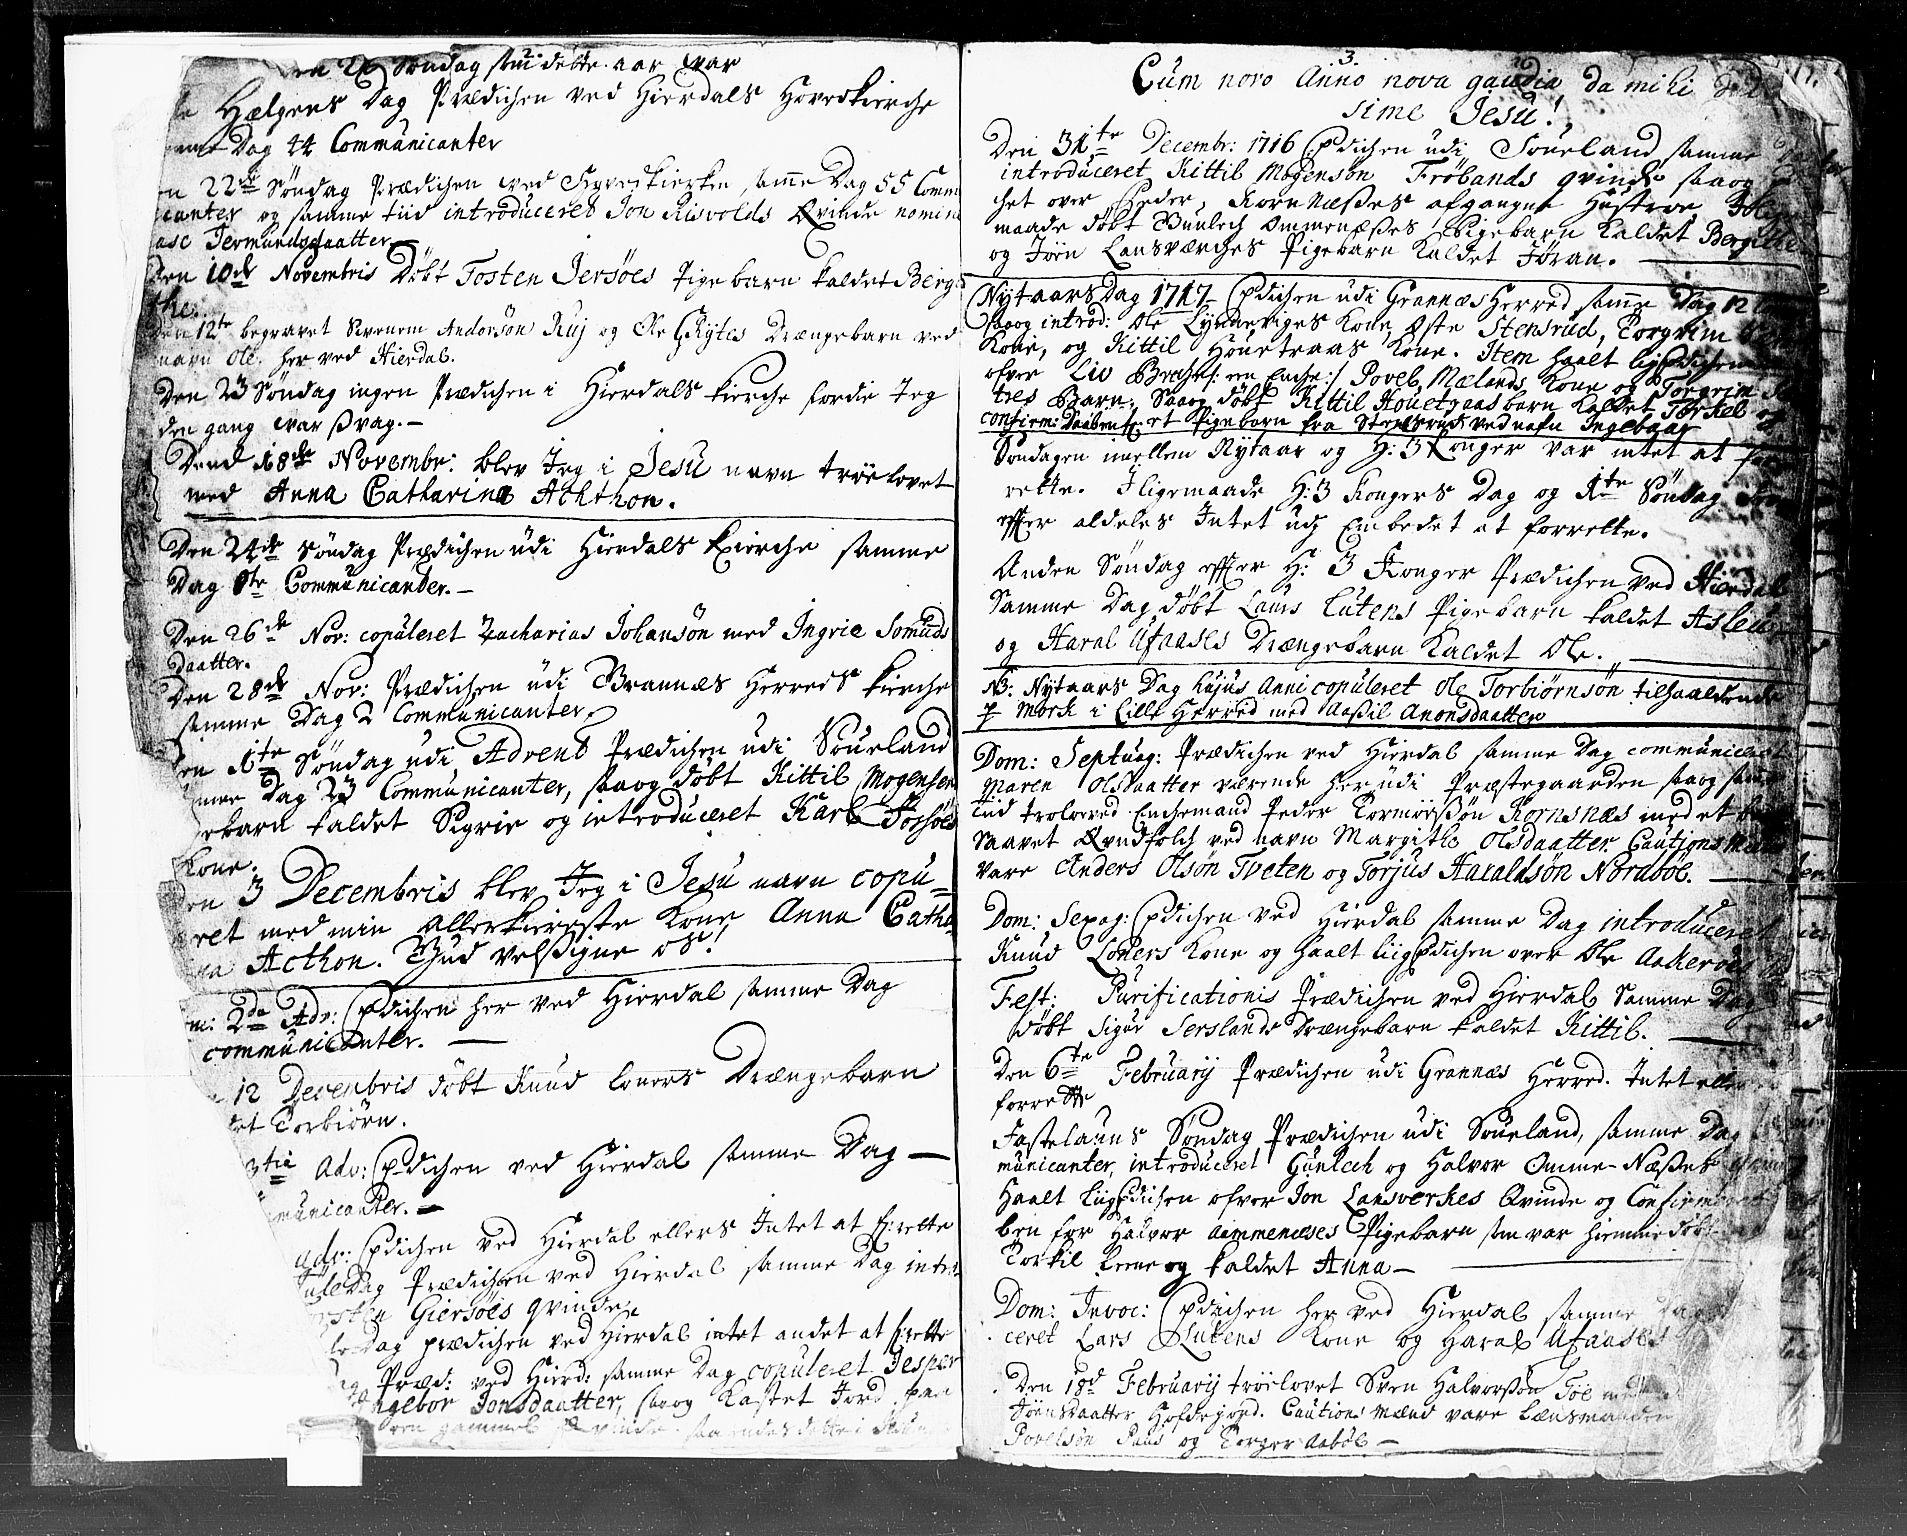 SAKO, Hjartdal kirkebøker, F/Fa/L0002: Ministerialbok nr. I 2, 1716-1754, s. 2-3